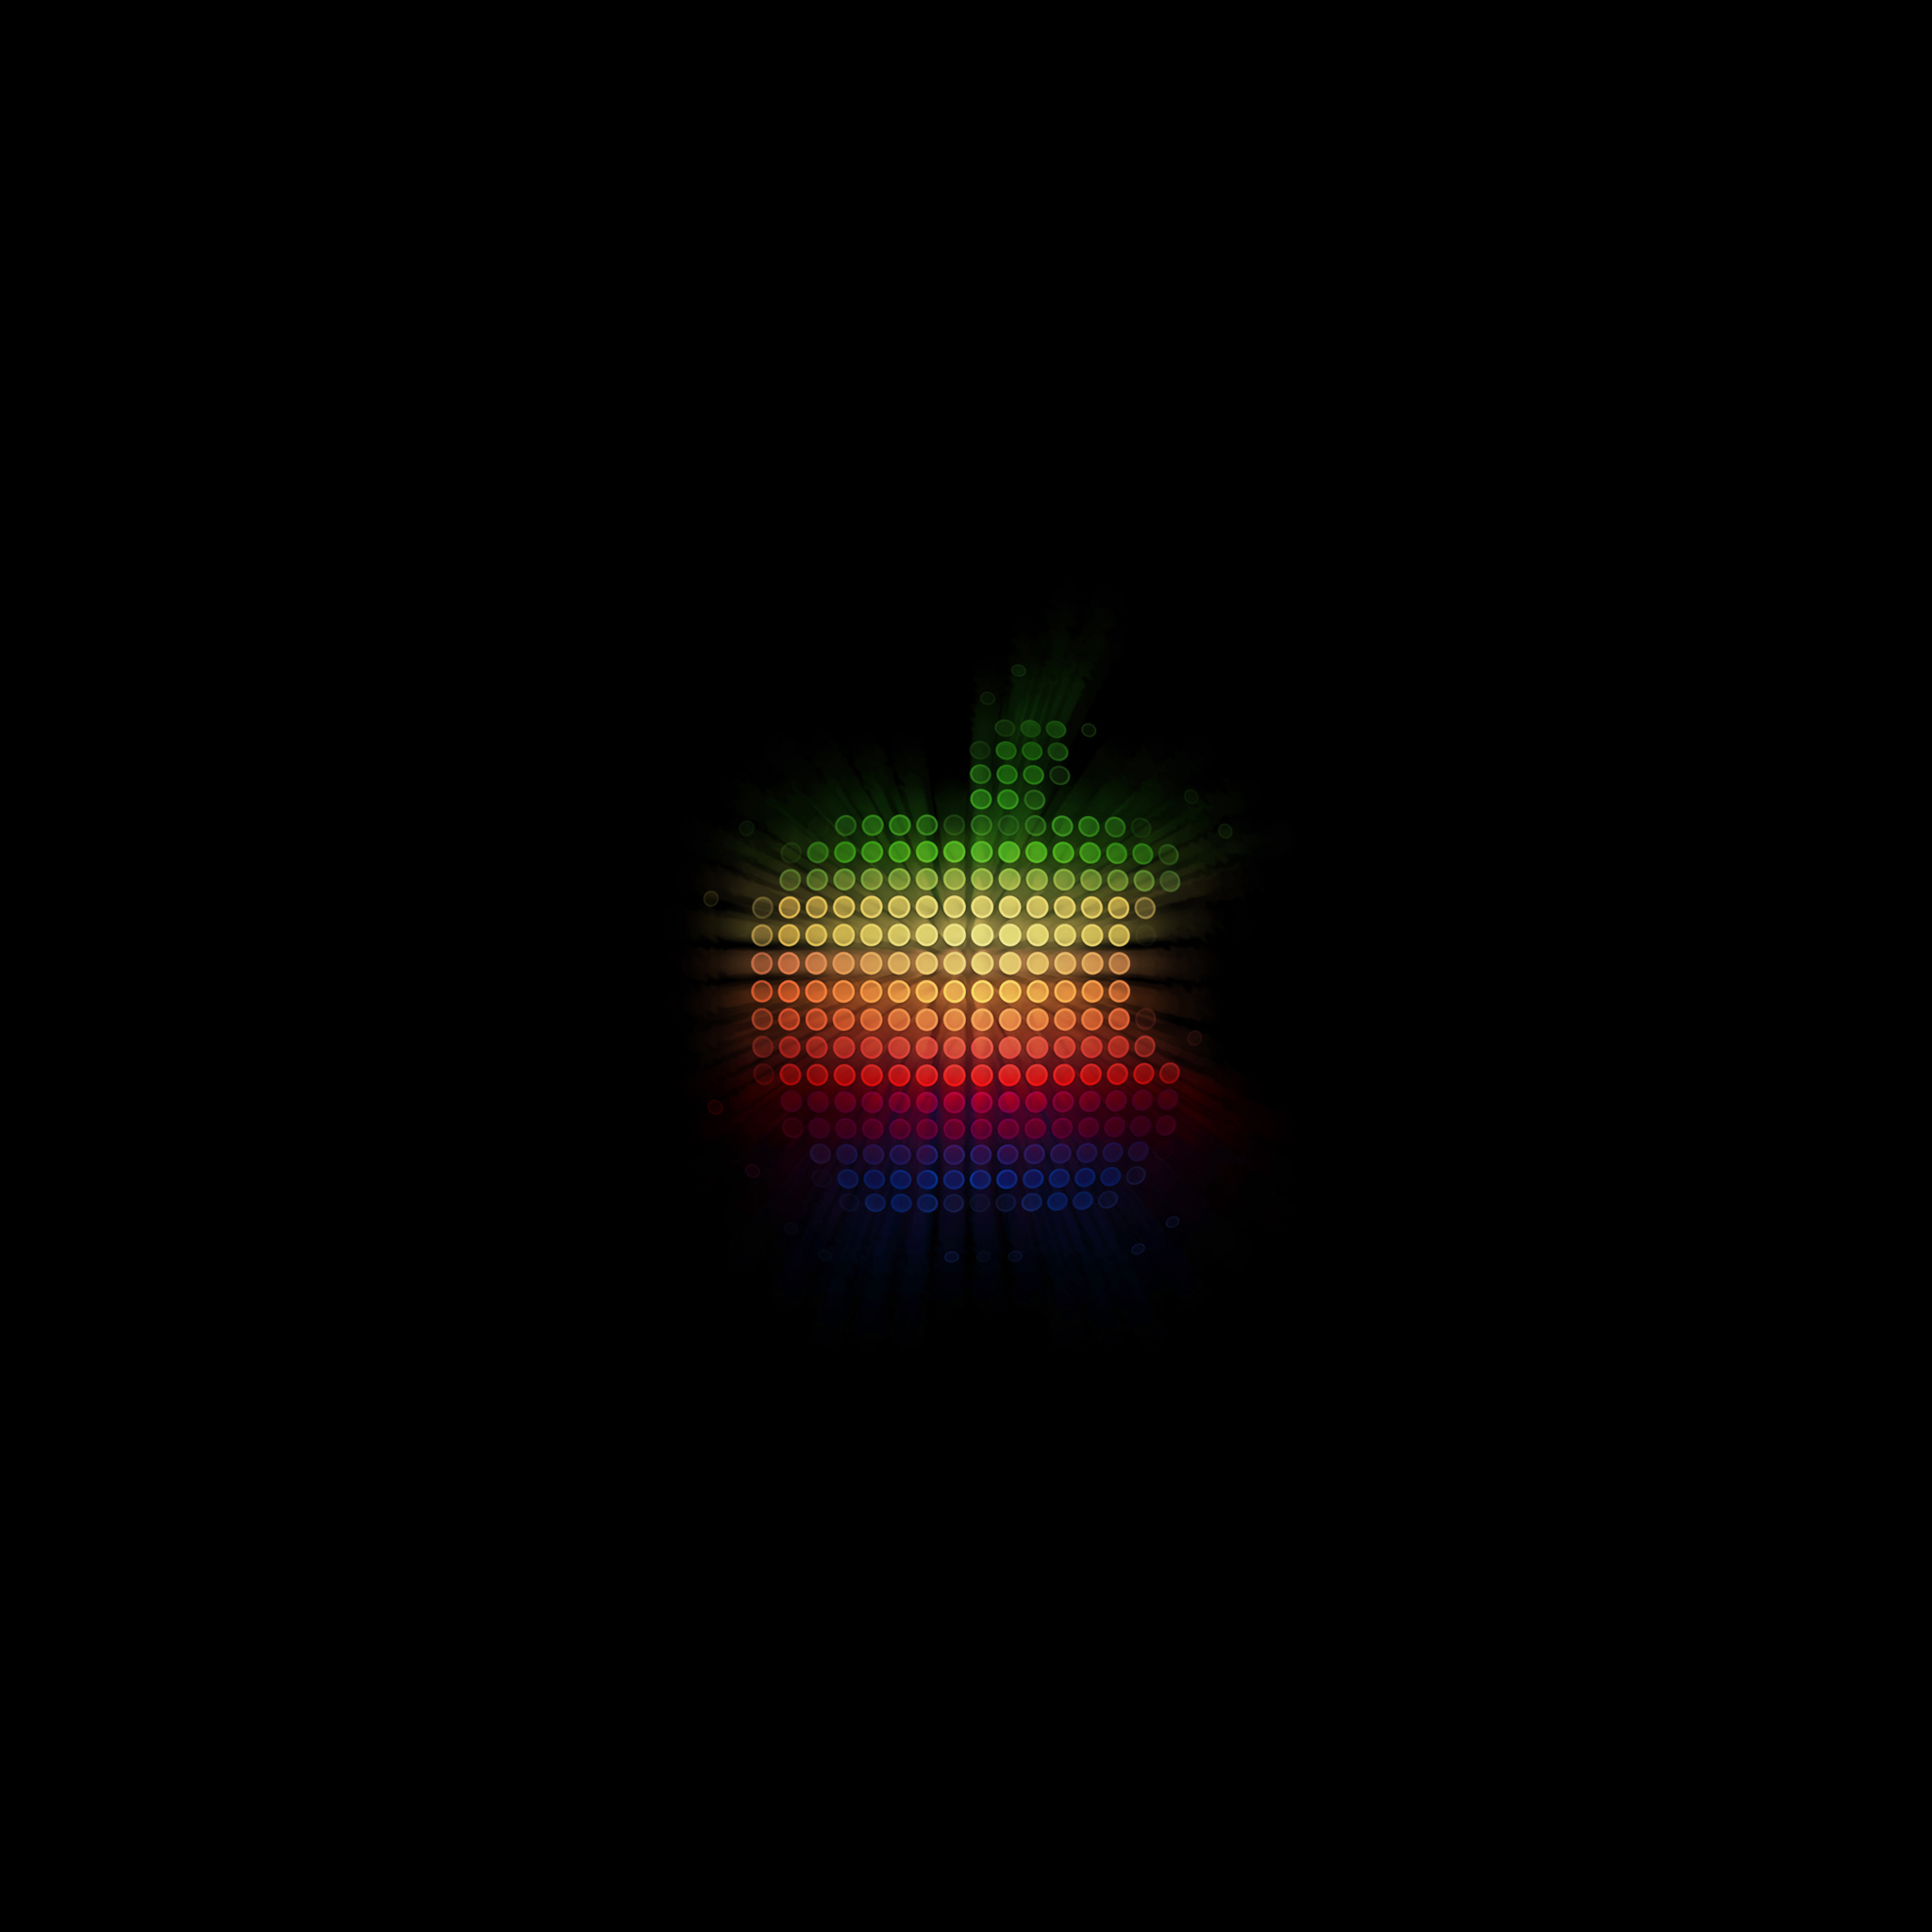 Apple iPad Air Wallpaper Download iPhone Wallpapers iPad wallpapers 2048x2048